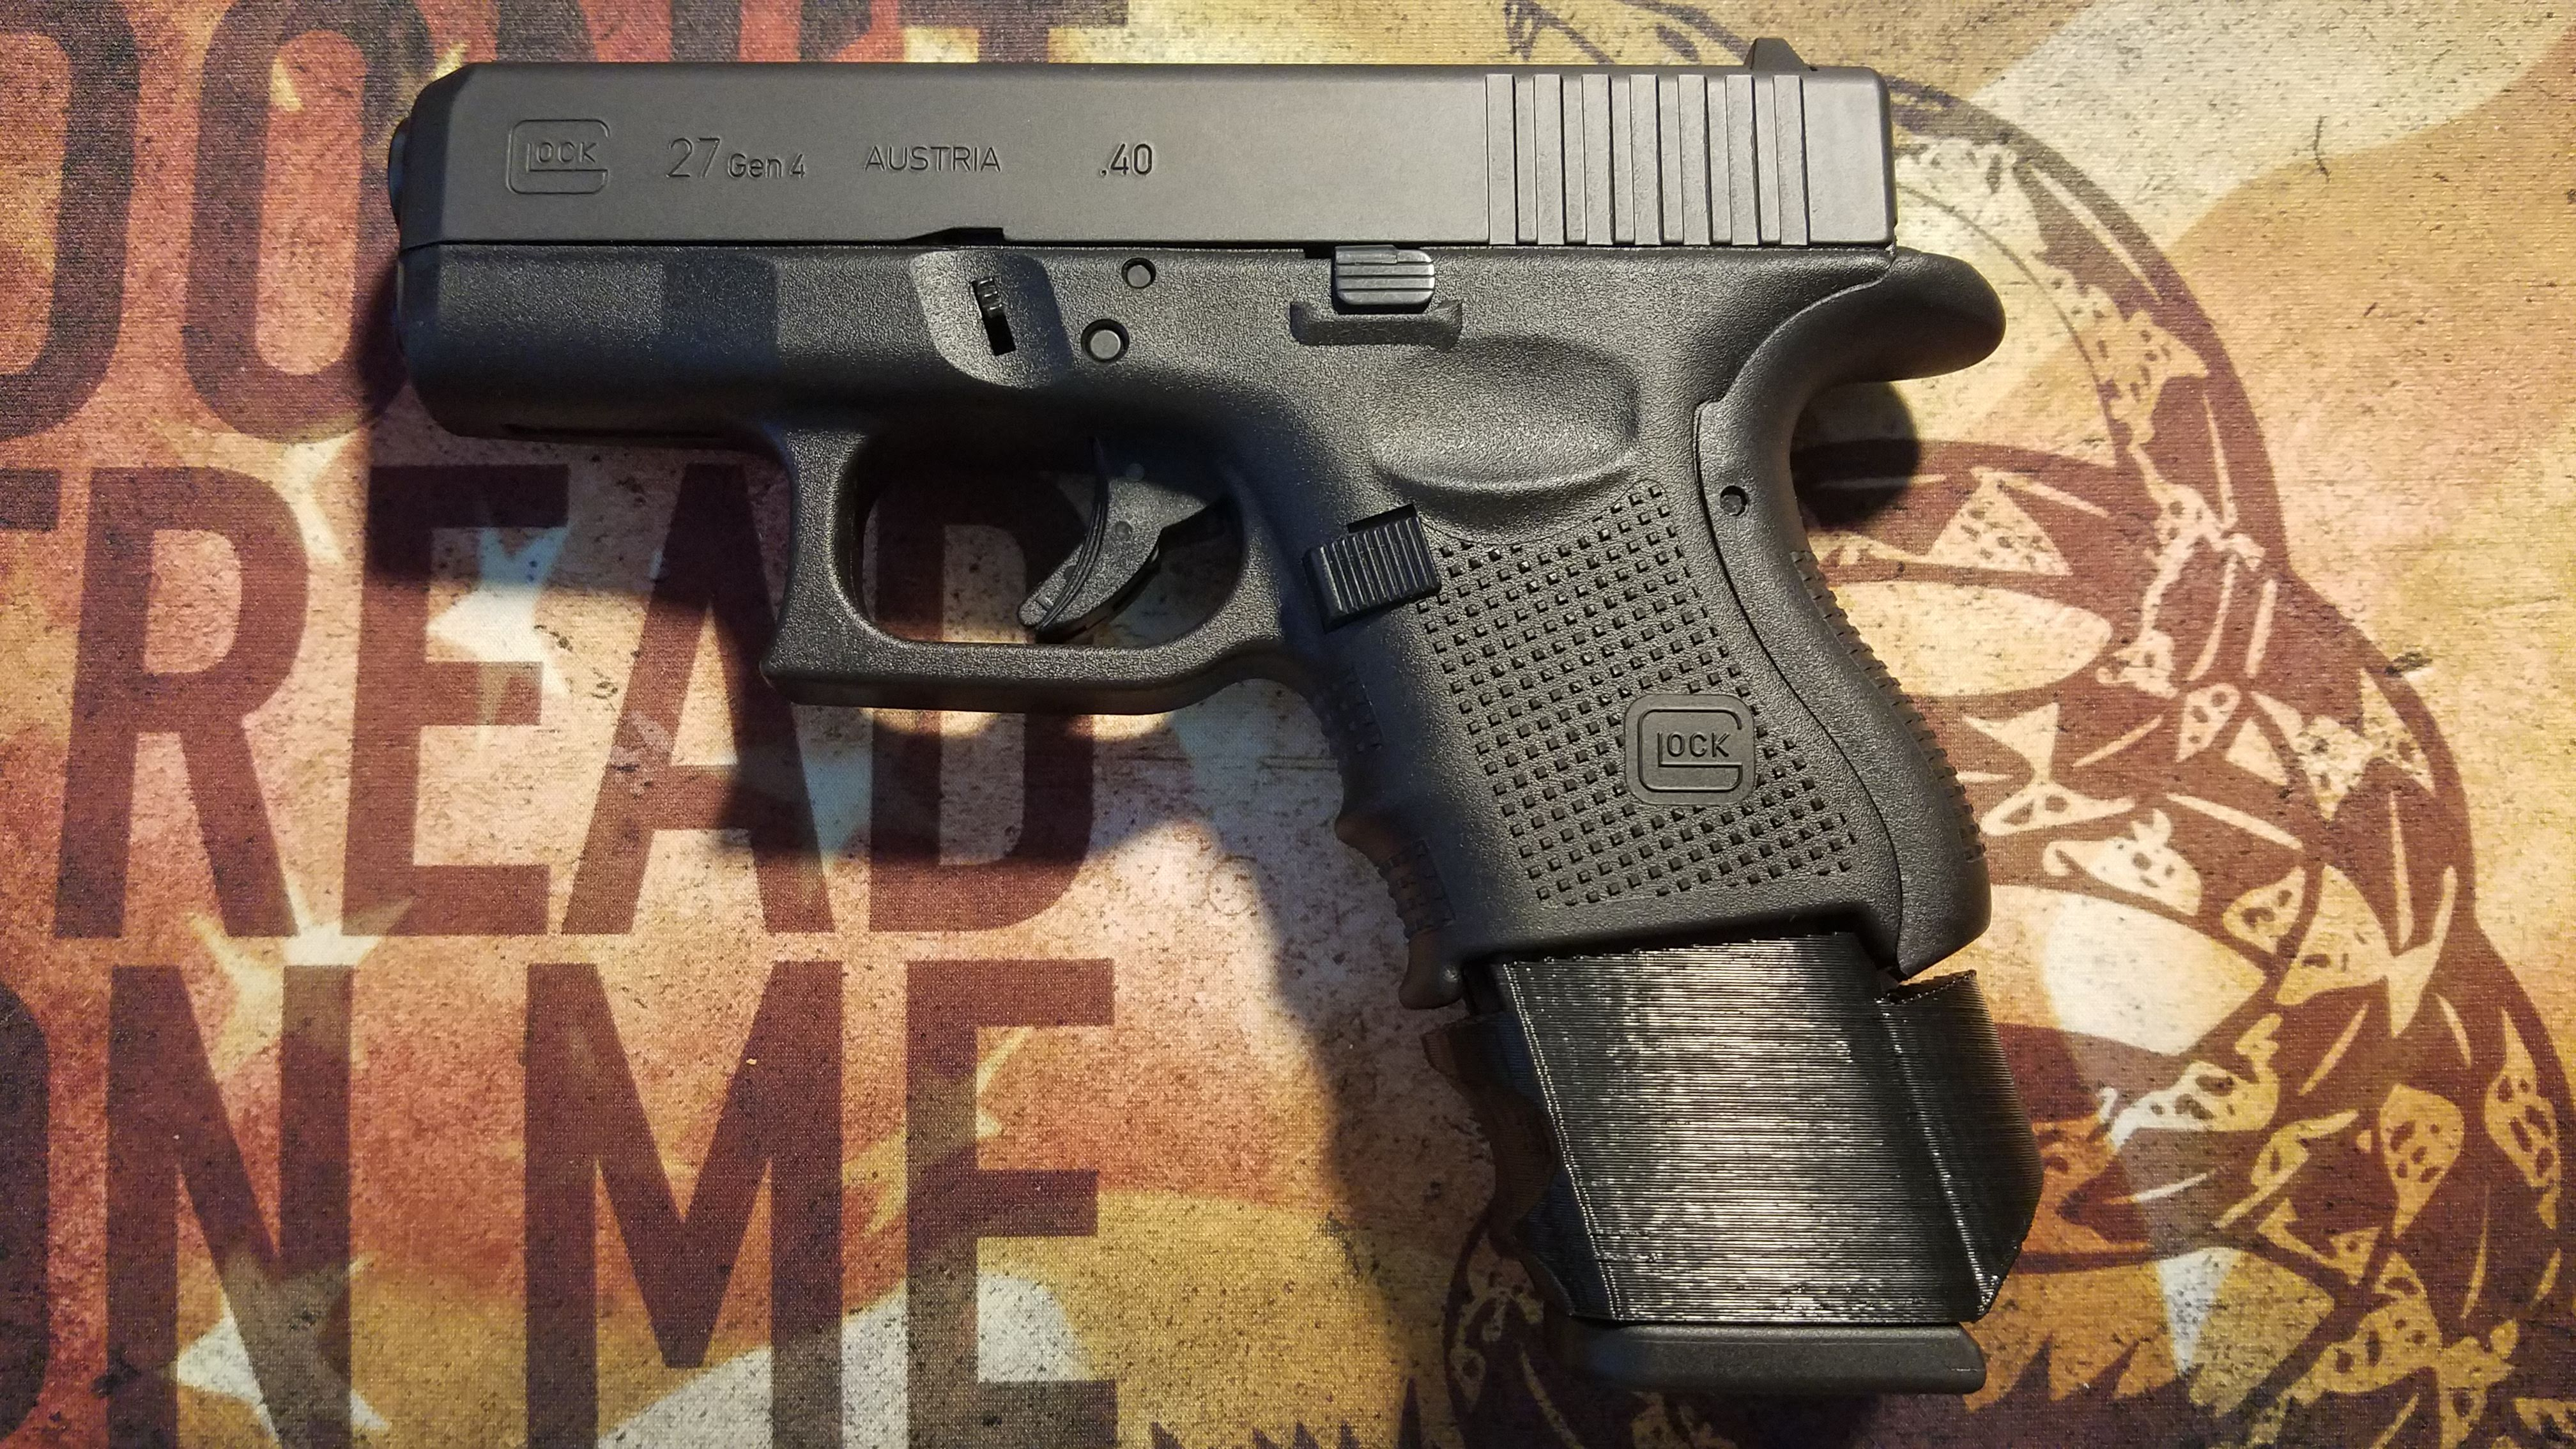 Glock 22 Magazine Sleeve for Glock 27 Compact